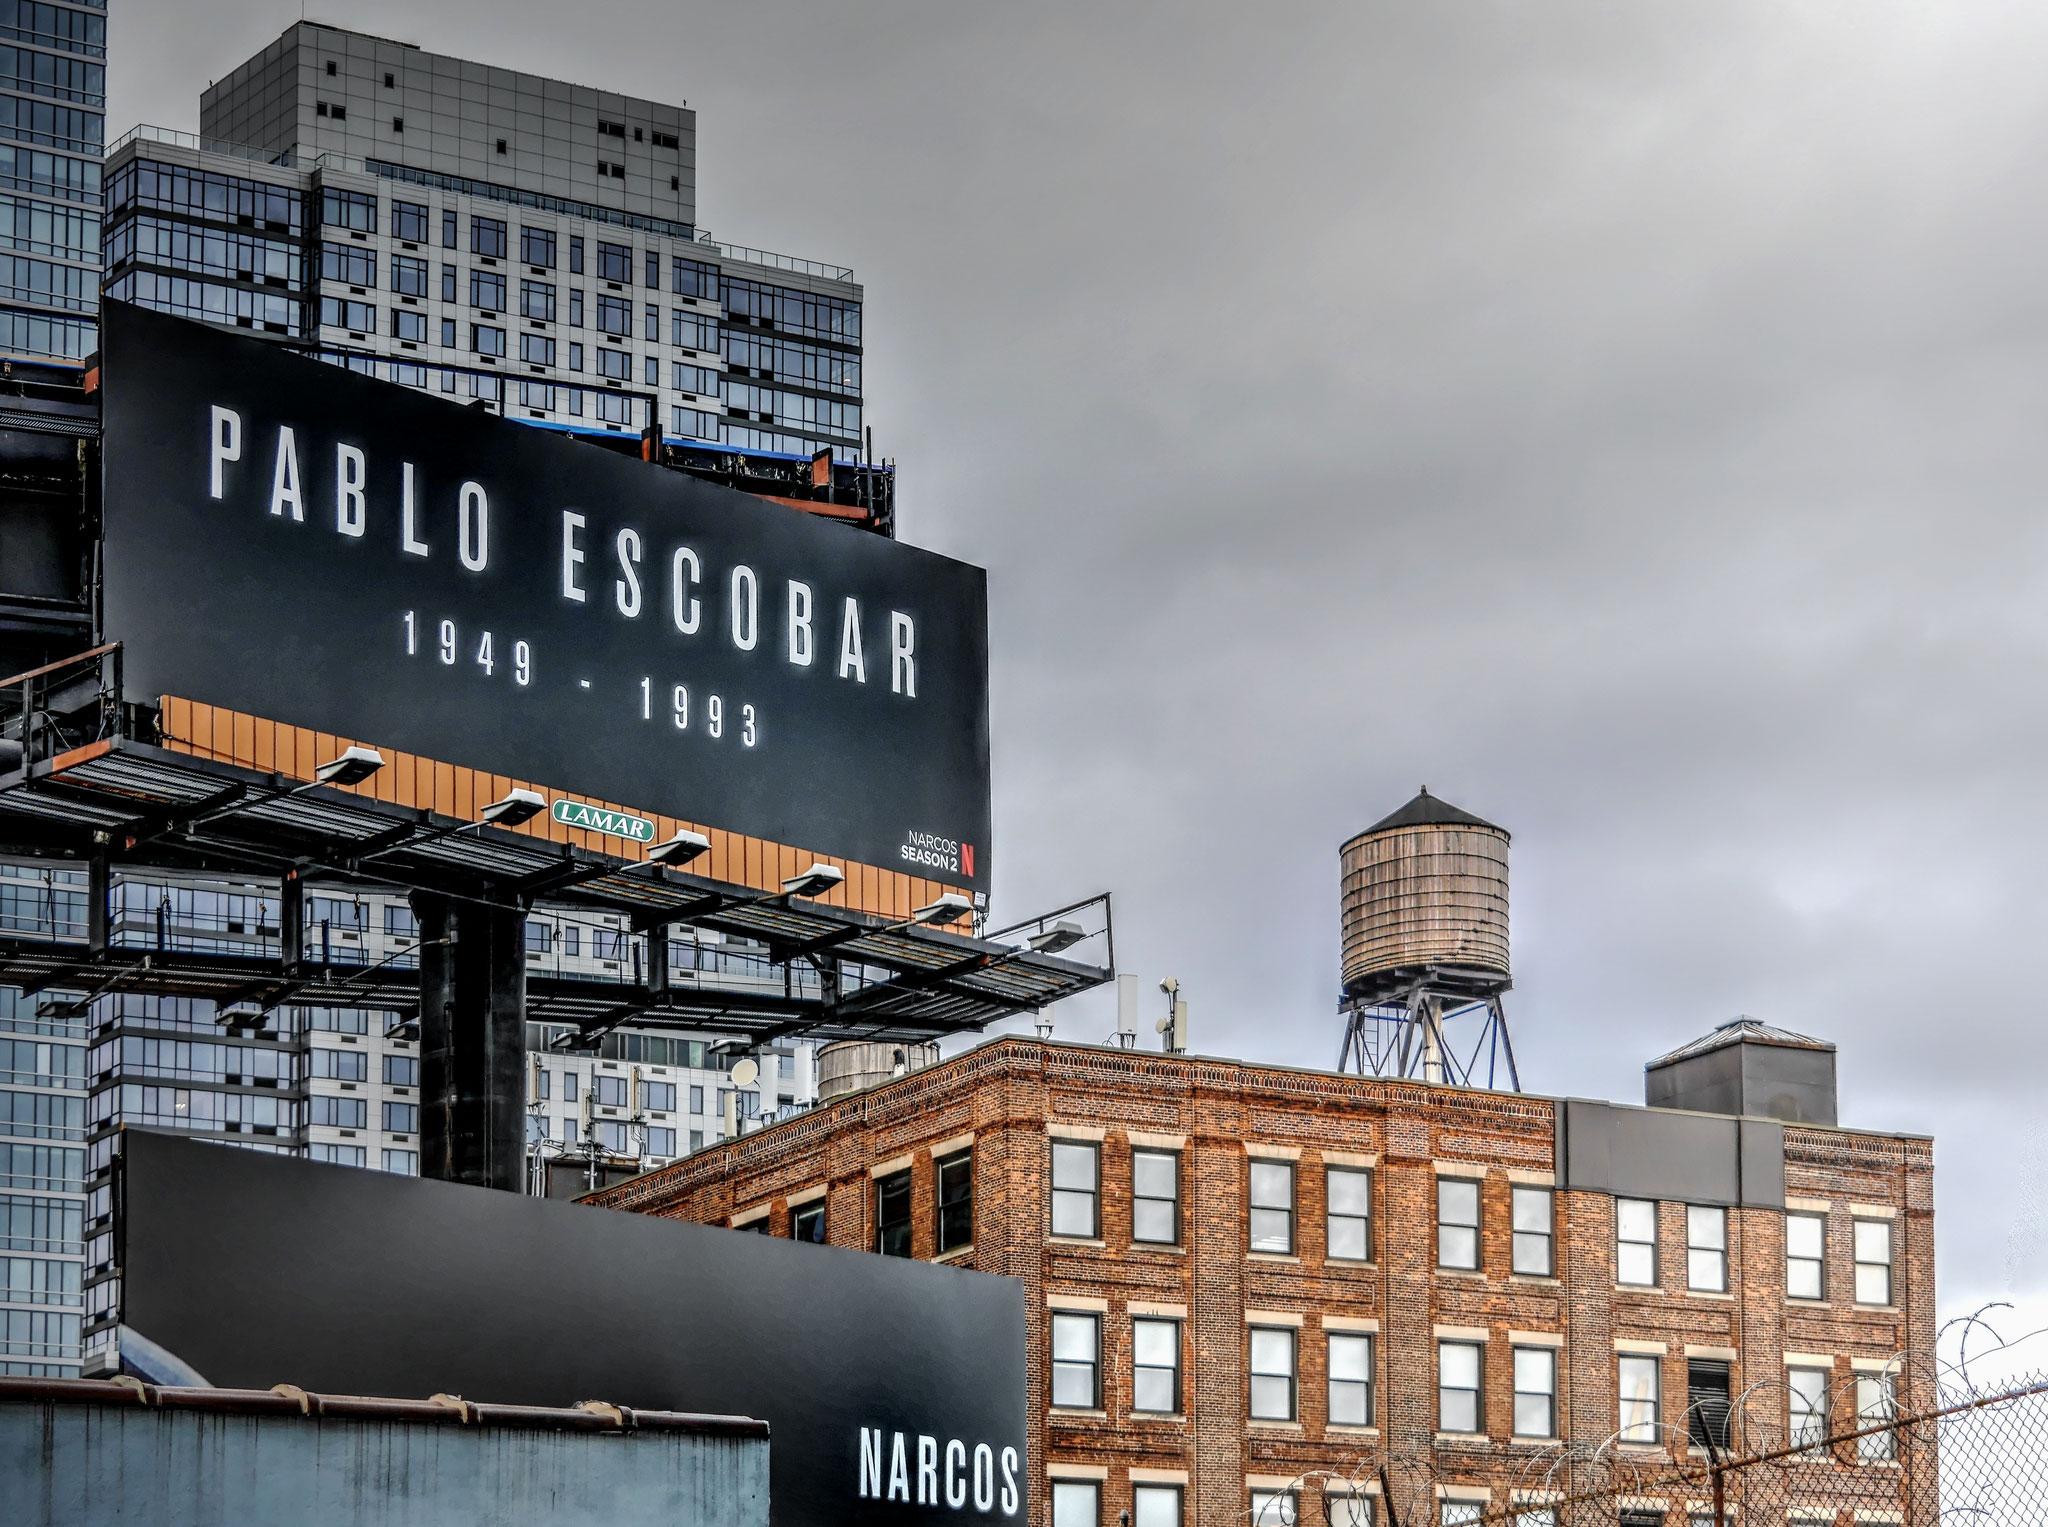 · pablo escobar · new york city · yak © 2016 RK